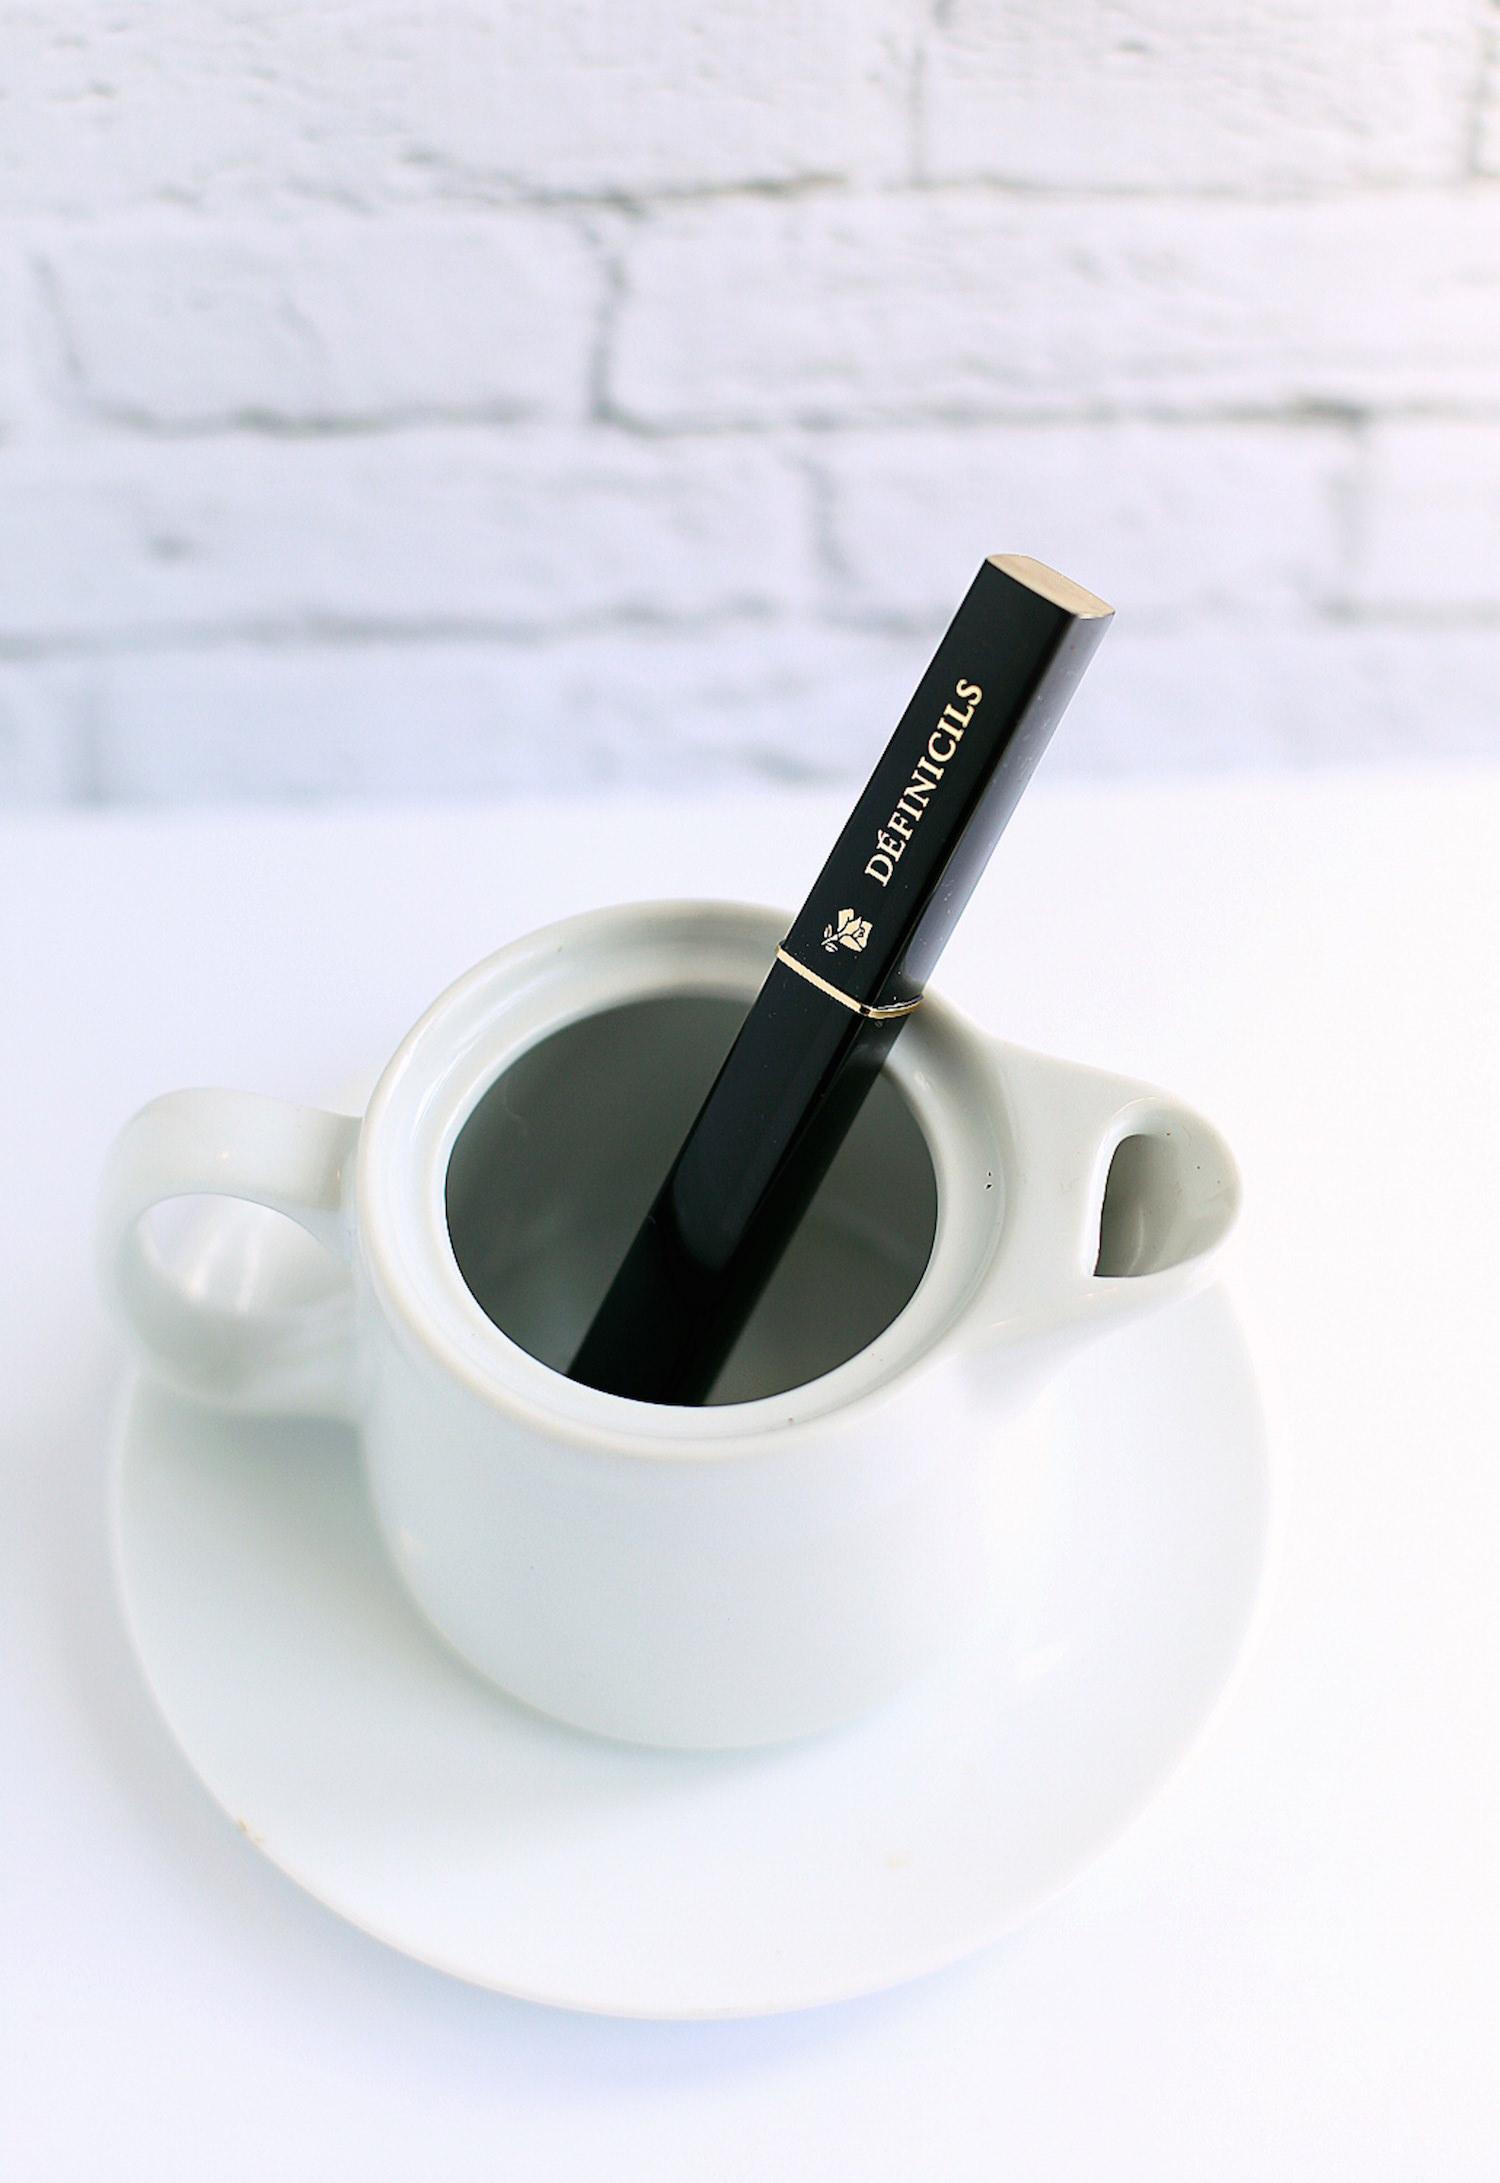 My 10 New Favorite Beauty Products - Lancome Definicils Mascara | TrufflesandTrends.com